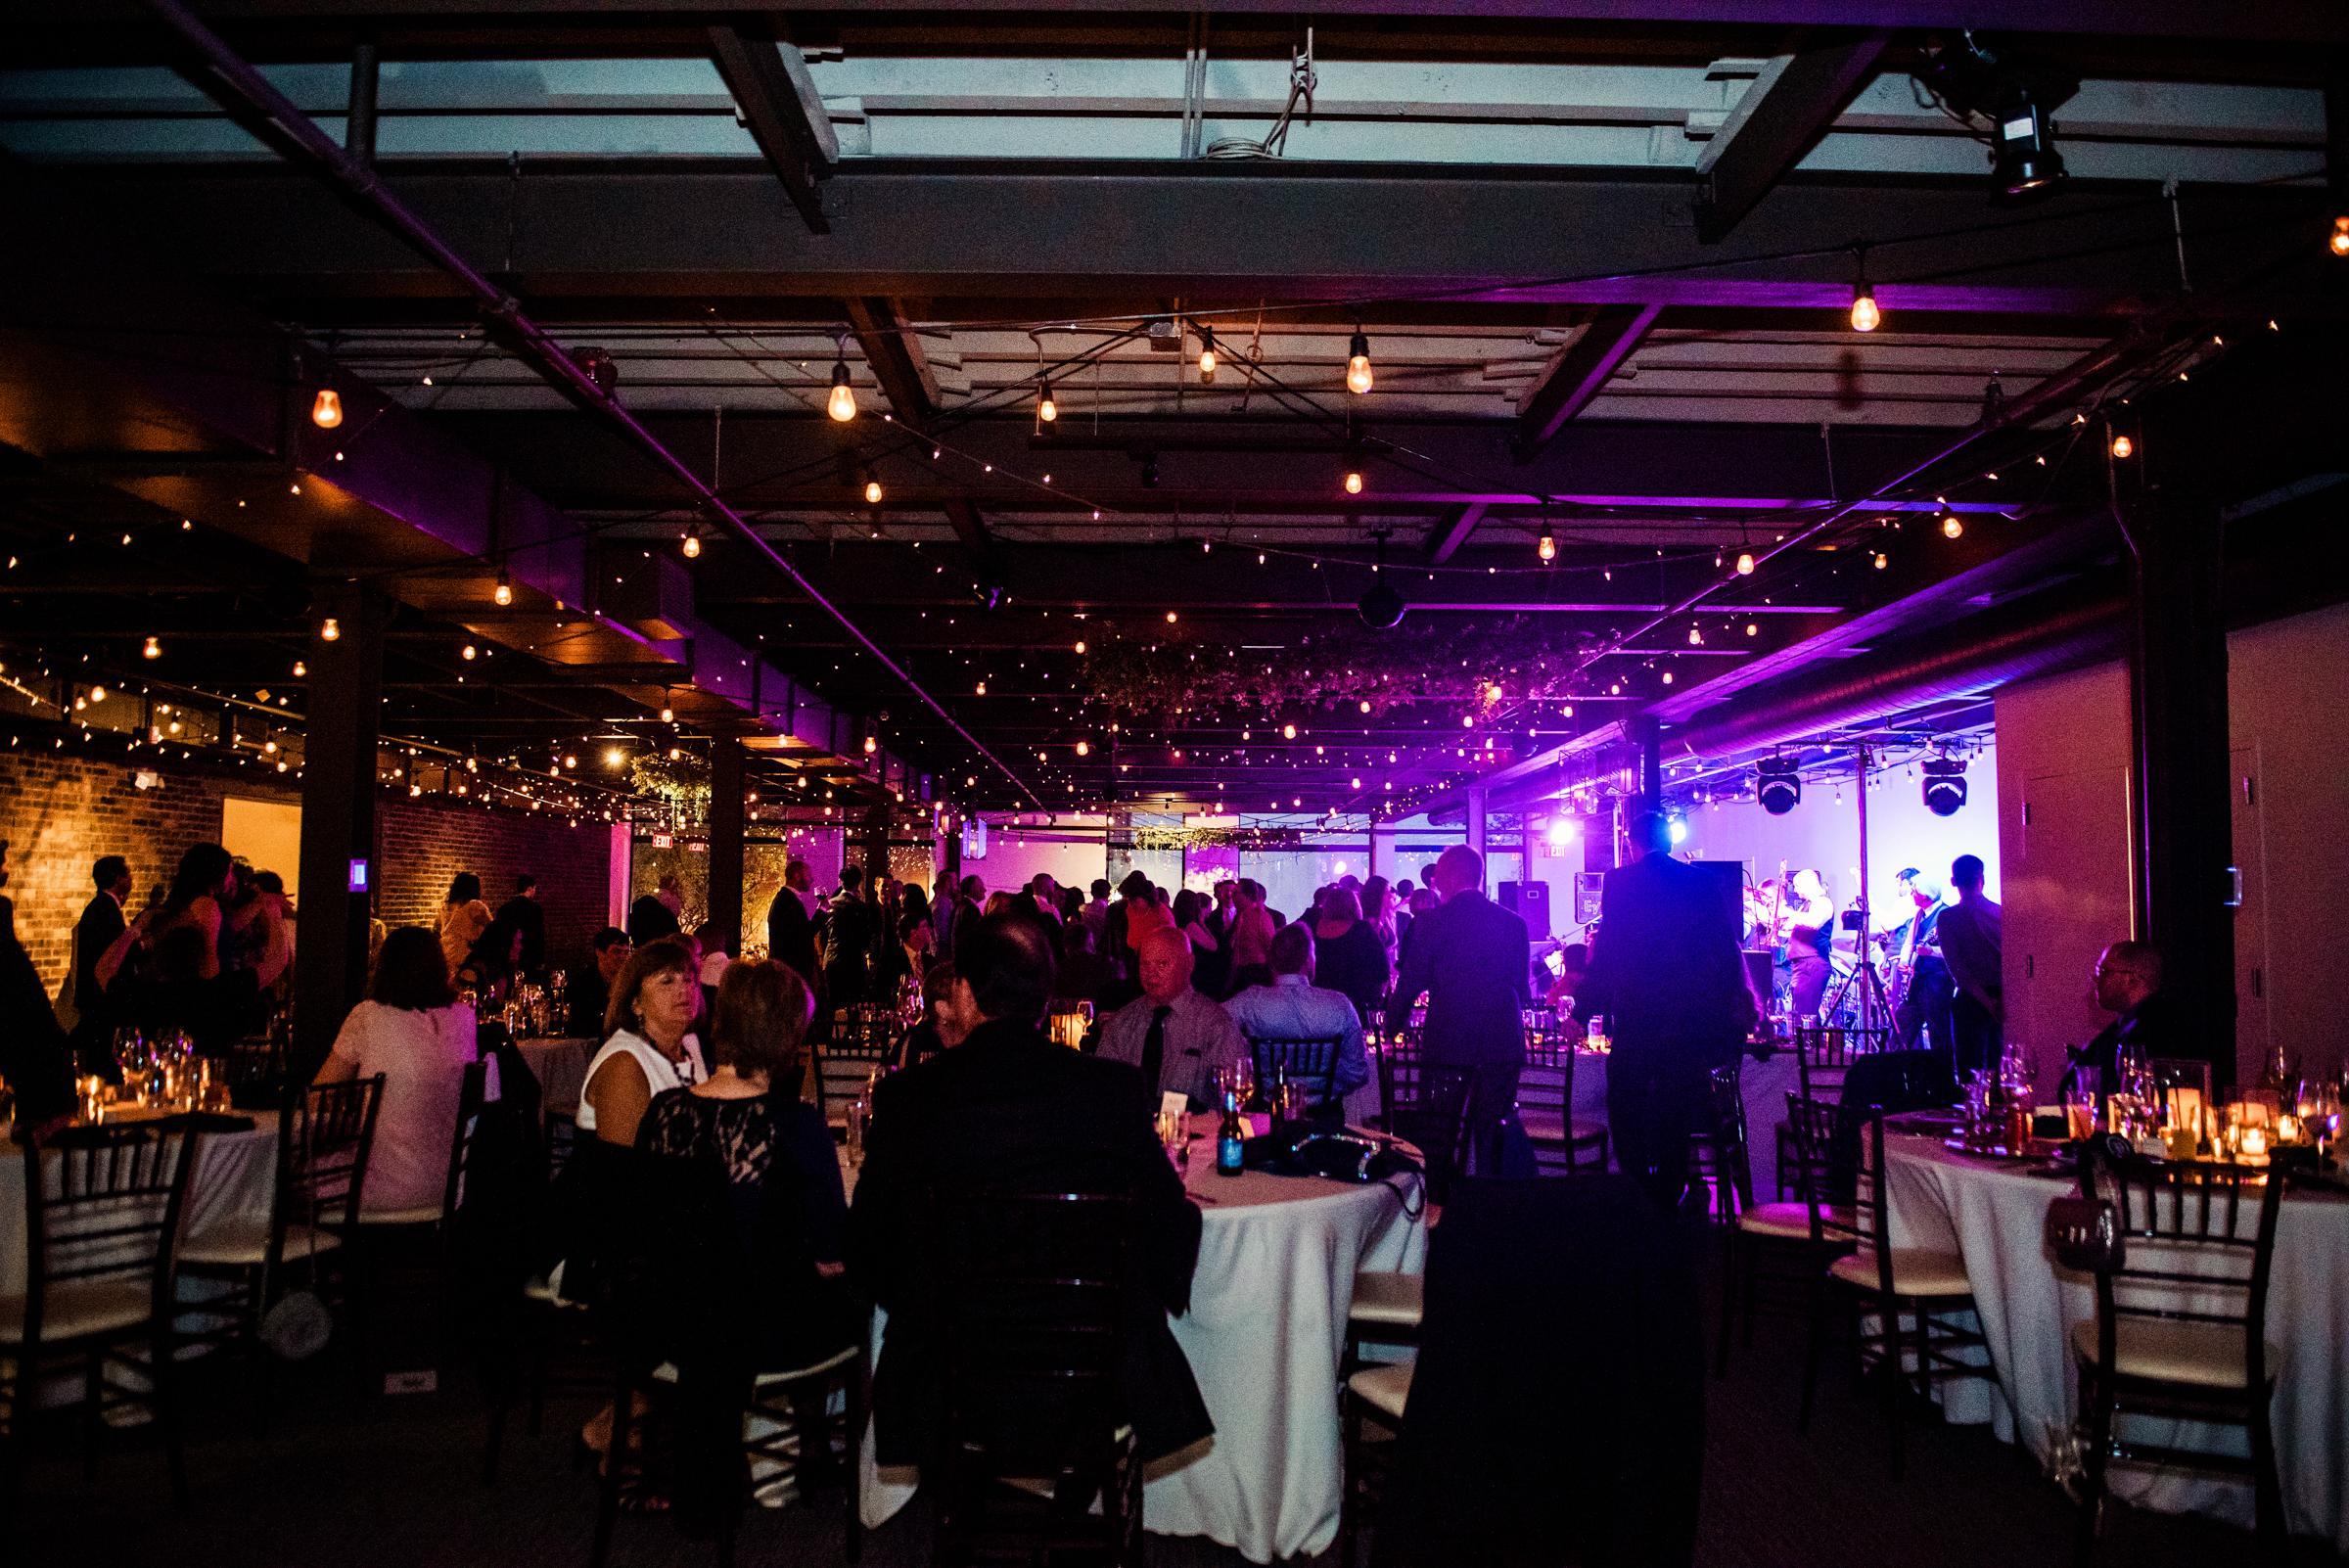 SKY_Armory_Syracuse_Wedding_JILL_STUDIO_Rochester_NY_Photographer_DSC_6376.jpg